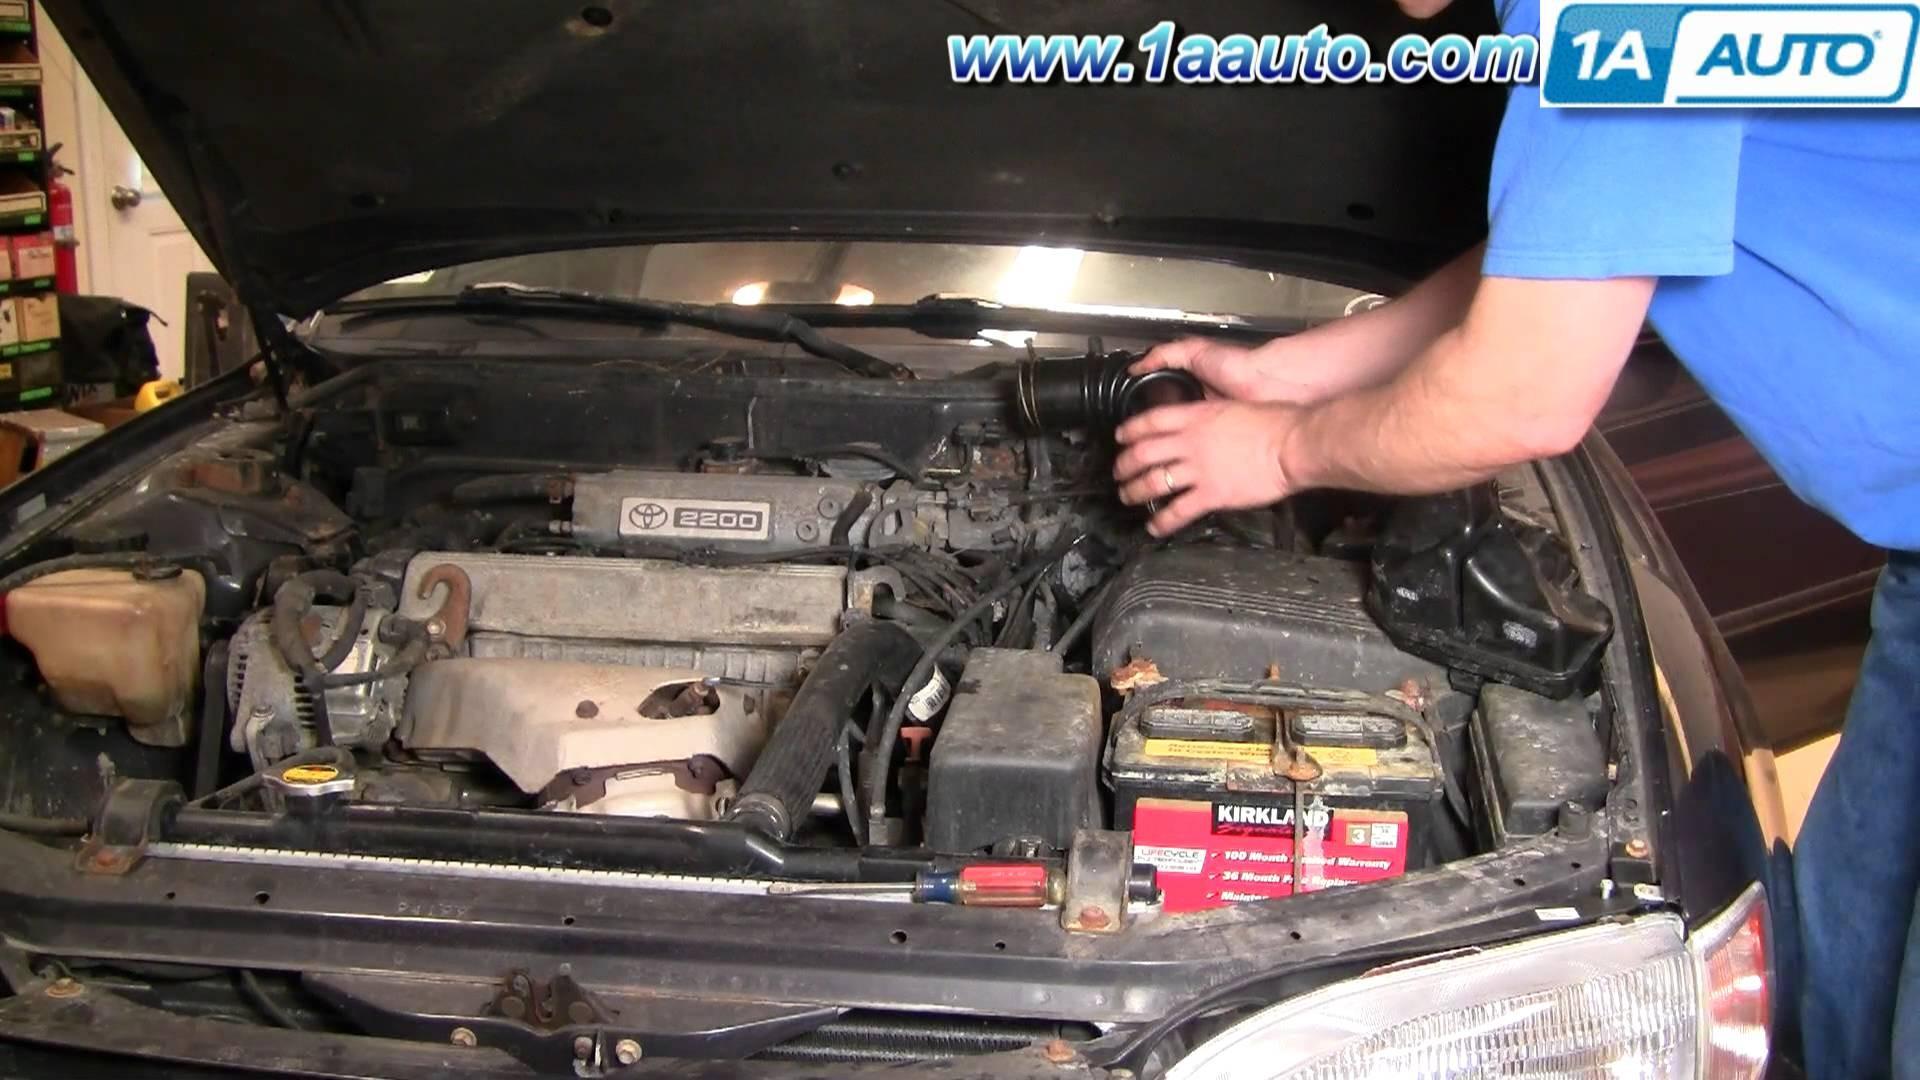 1999 Lexus Es300 Engine Diagram How to Install Replace Engine Air Intake  Hose toyota Camry 2 2l 95